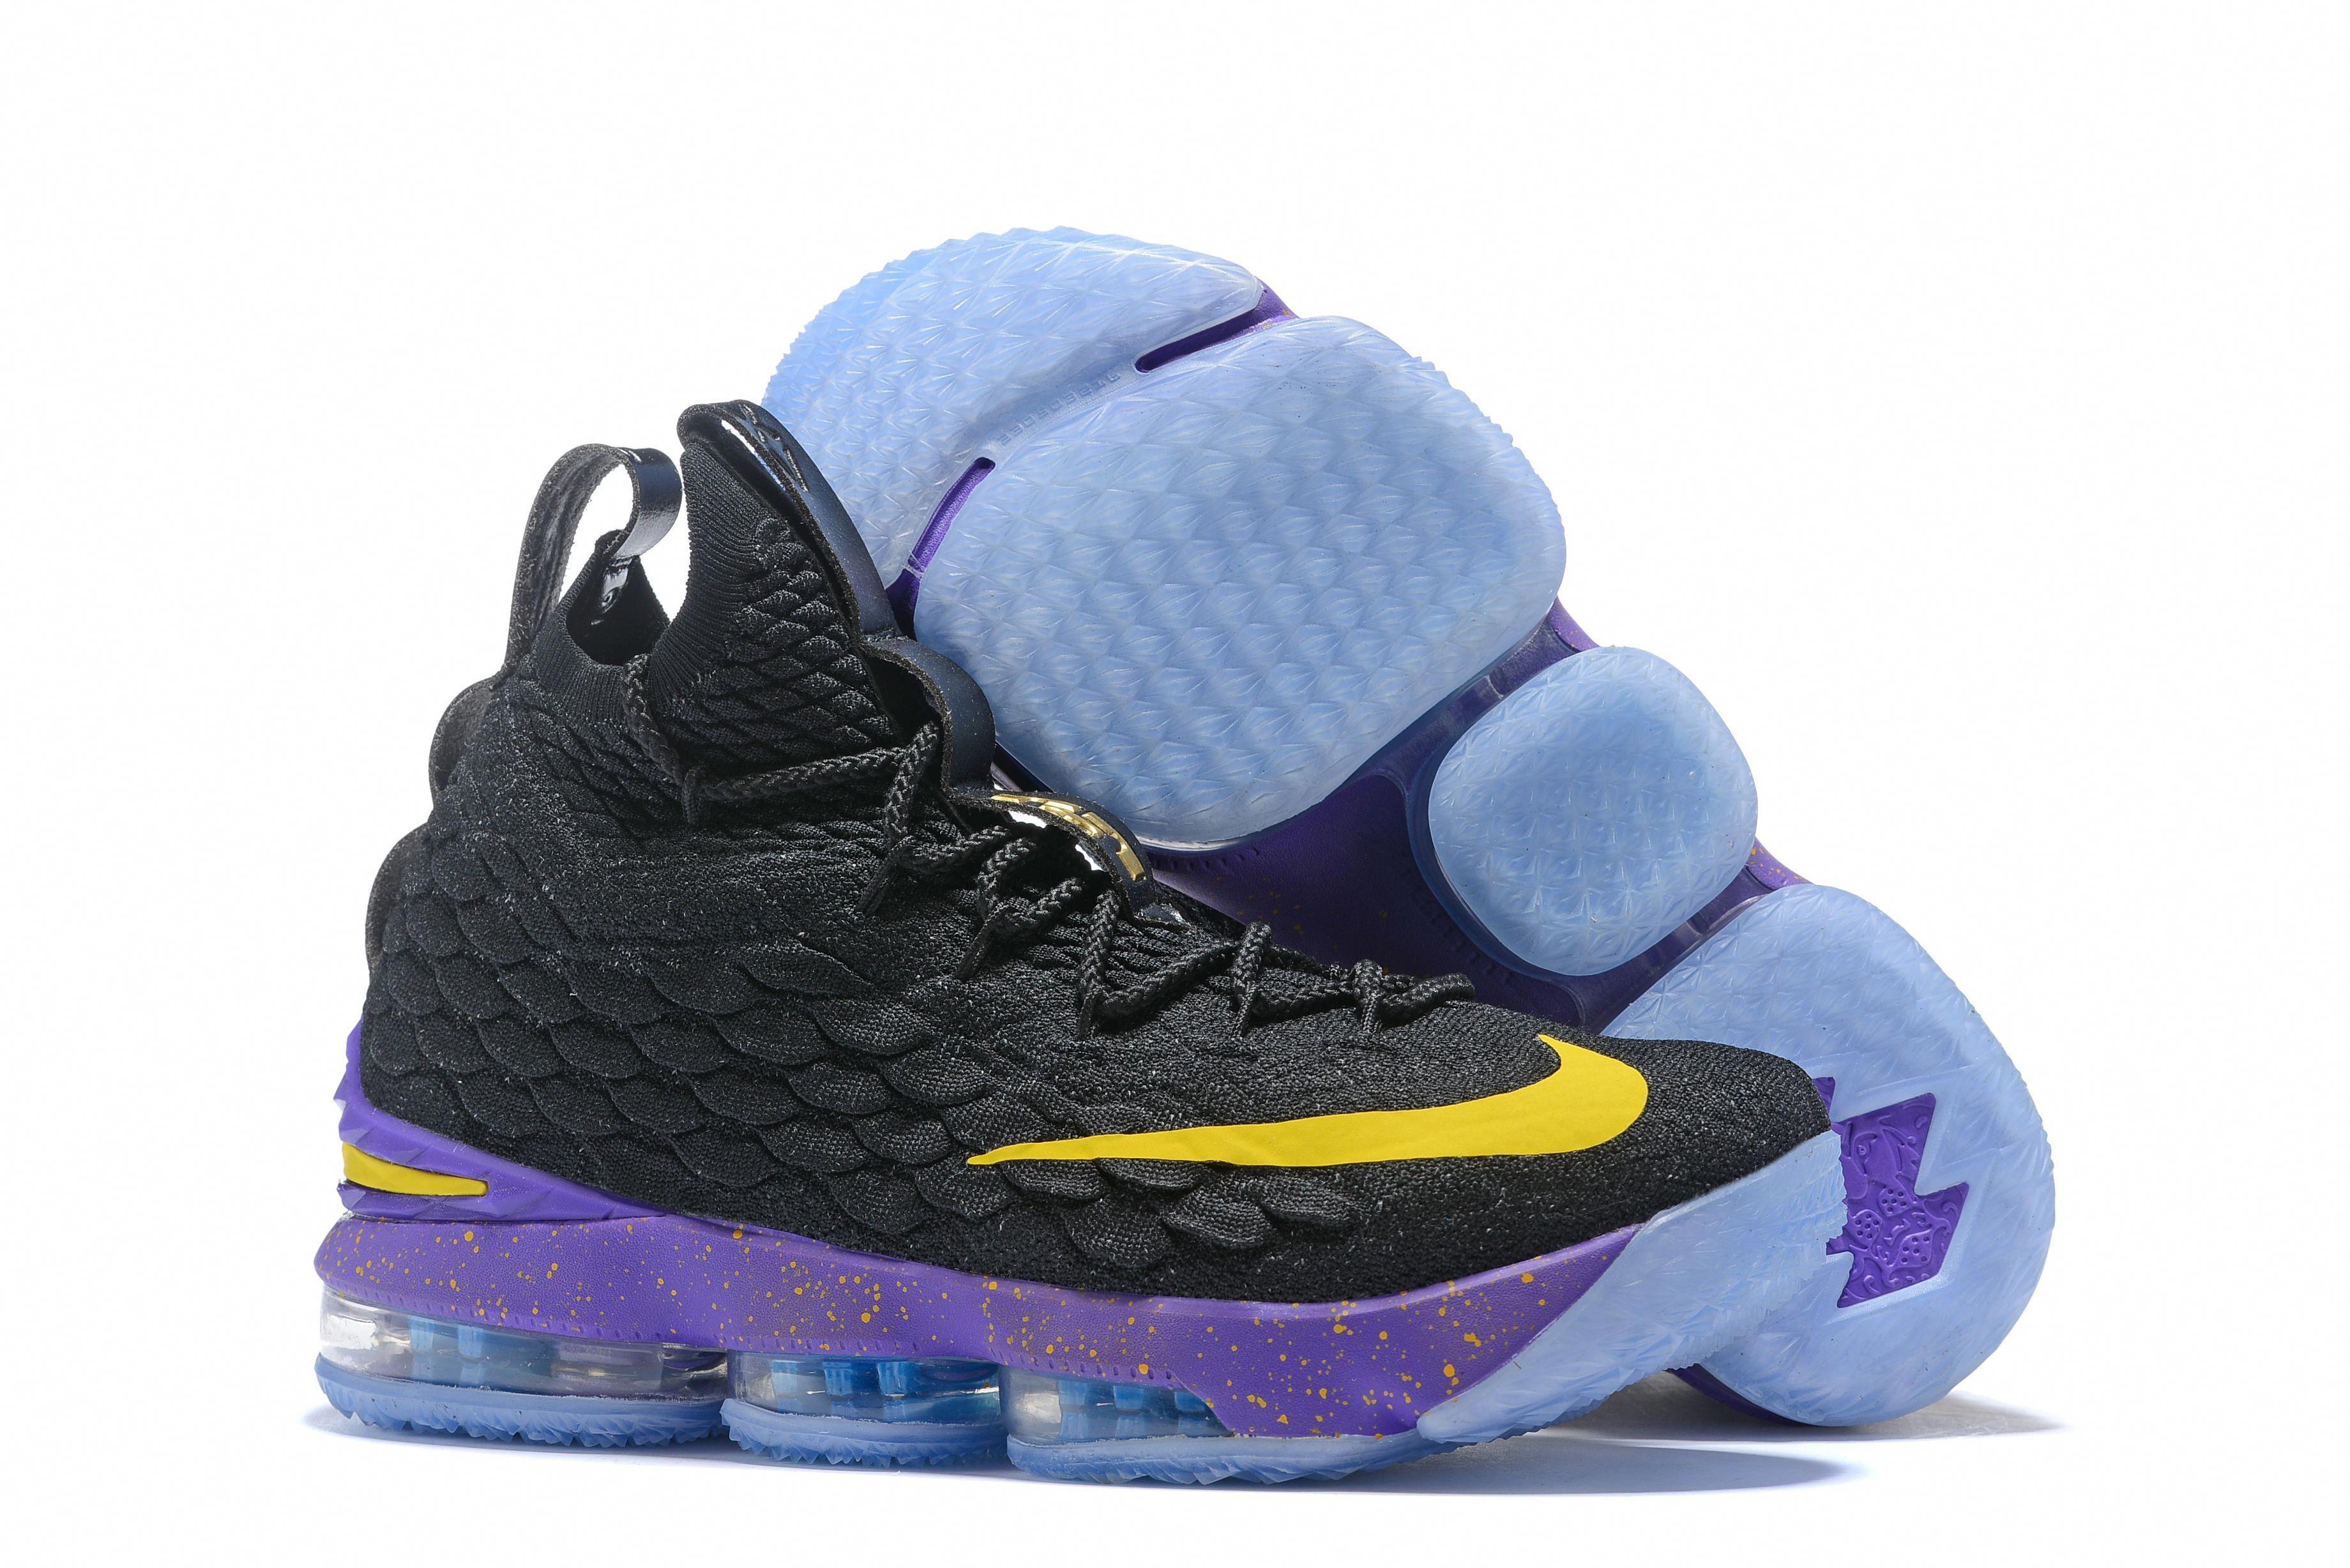 8fcdb275846 Nike LeBron 15 Black Purple-Yellow Men s Basketball Shoes  basketballshoes